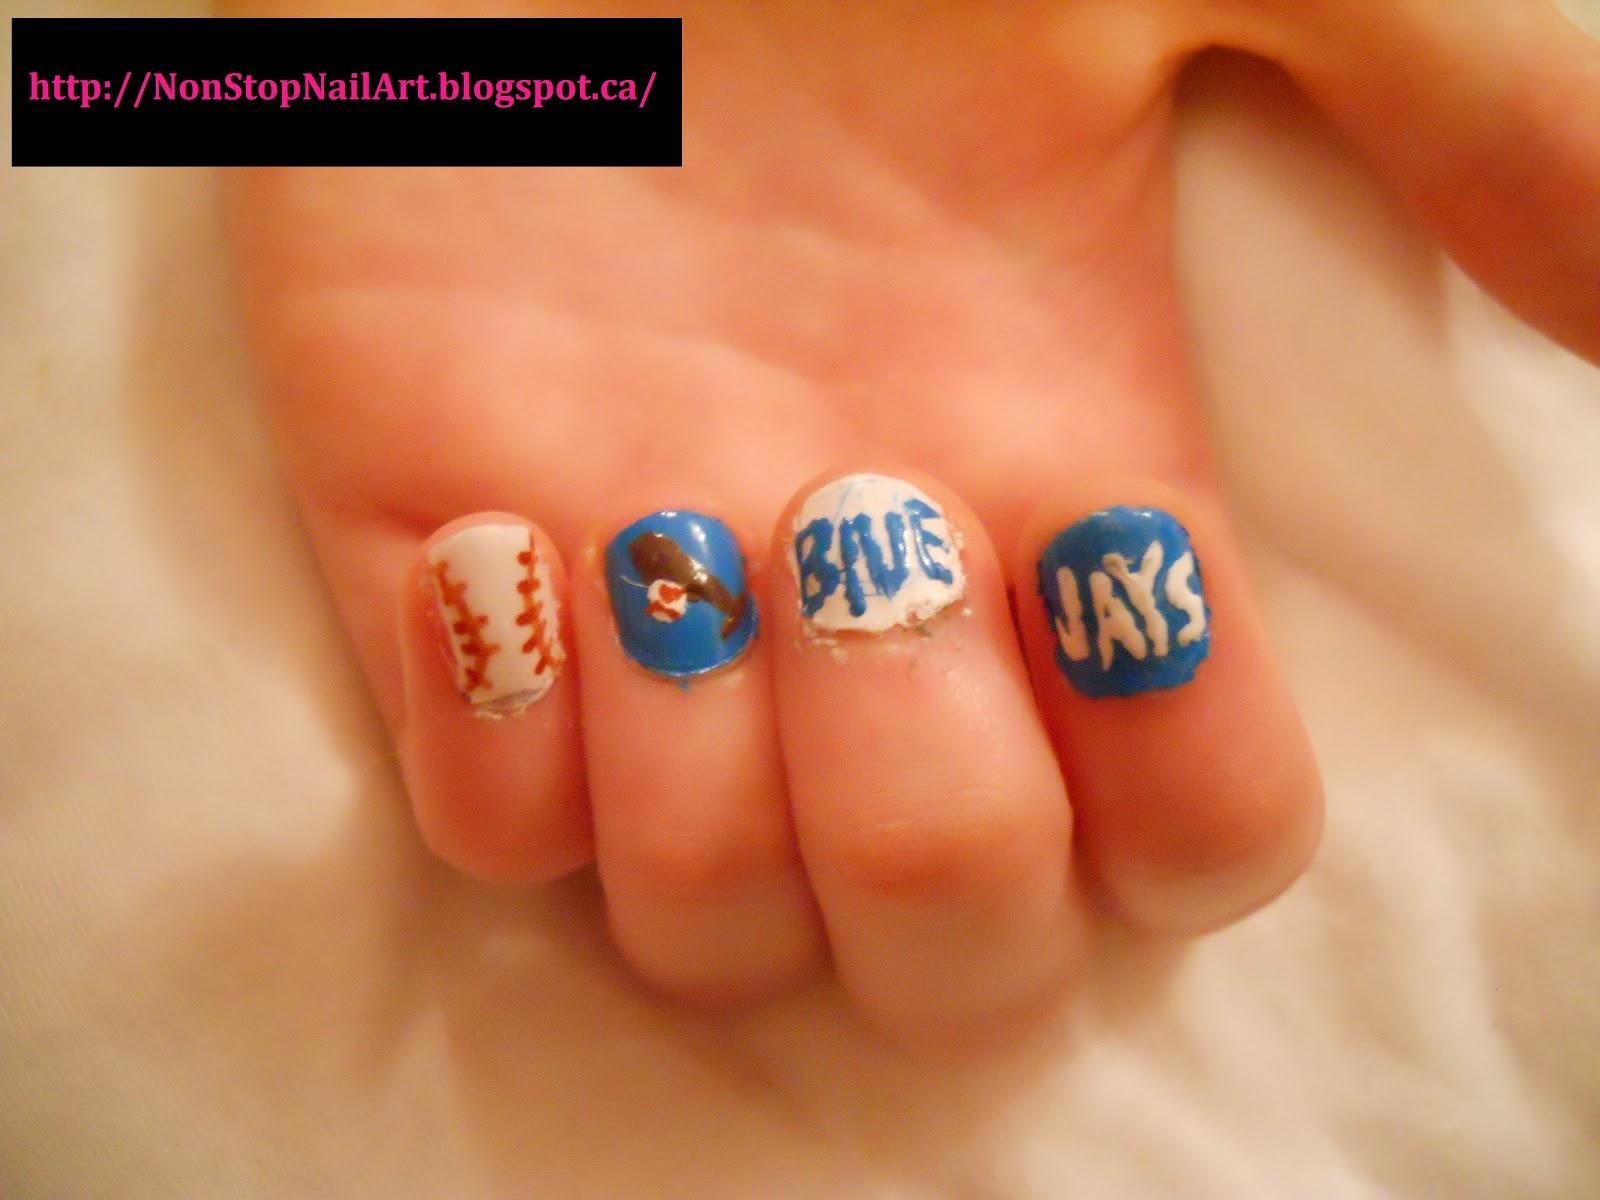 Go Blue Jays